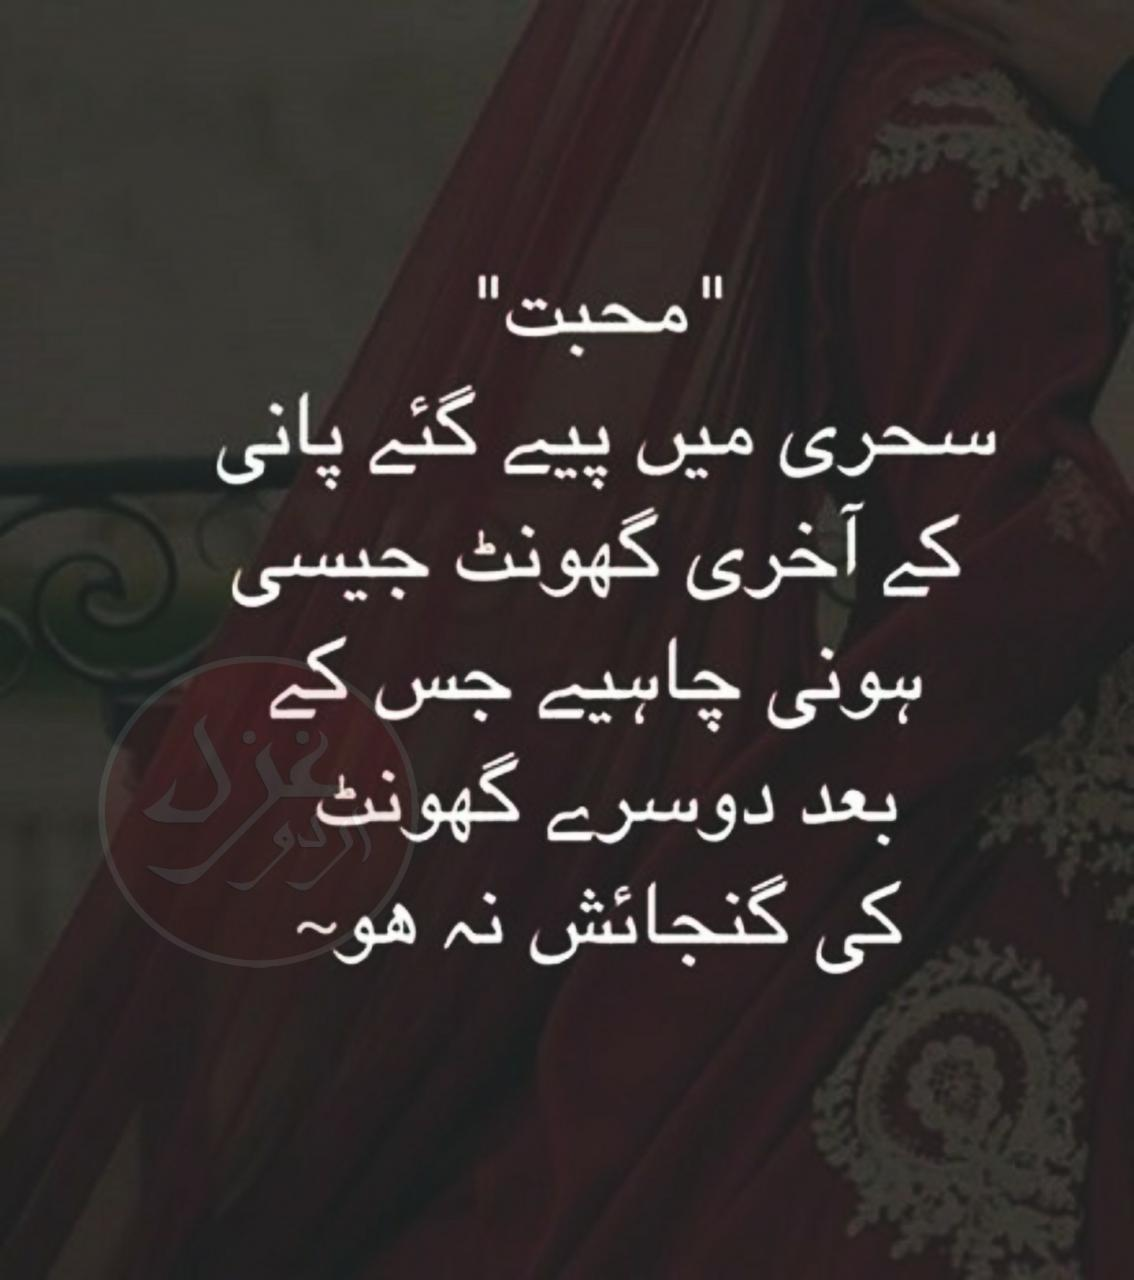 Love Quotes Short In Urdu Bht Khoob Toxn Pinterest Urdu